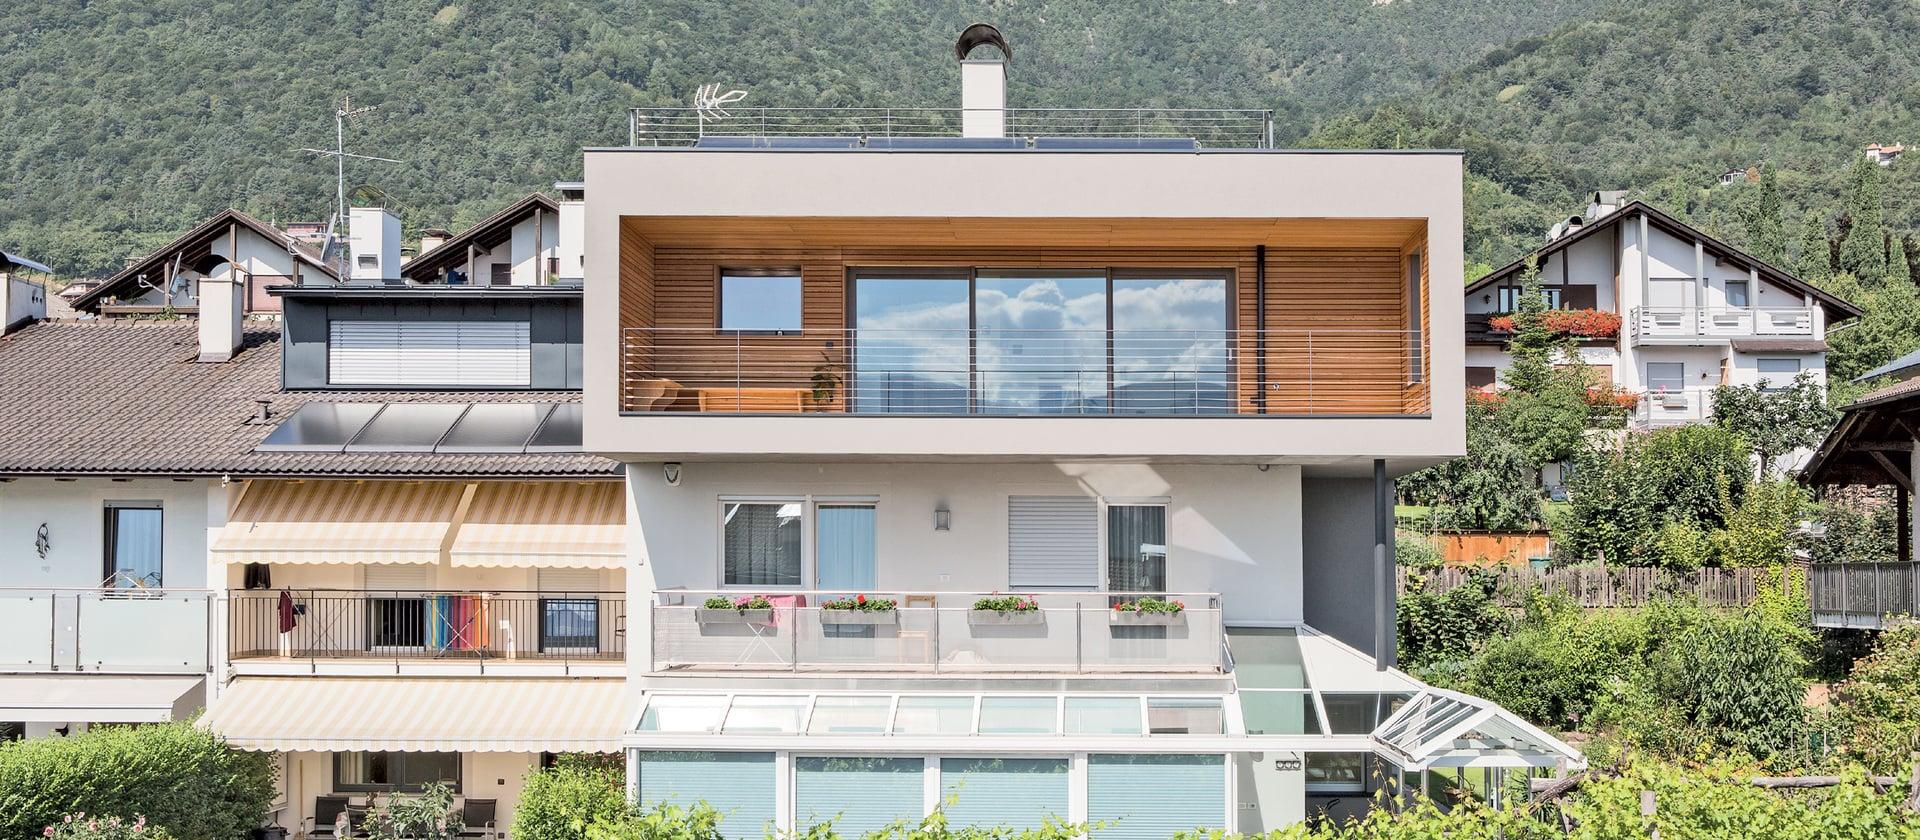 Casa en el lago Kalterer